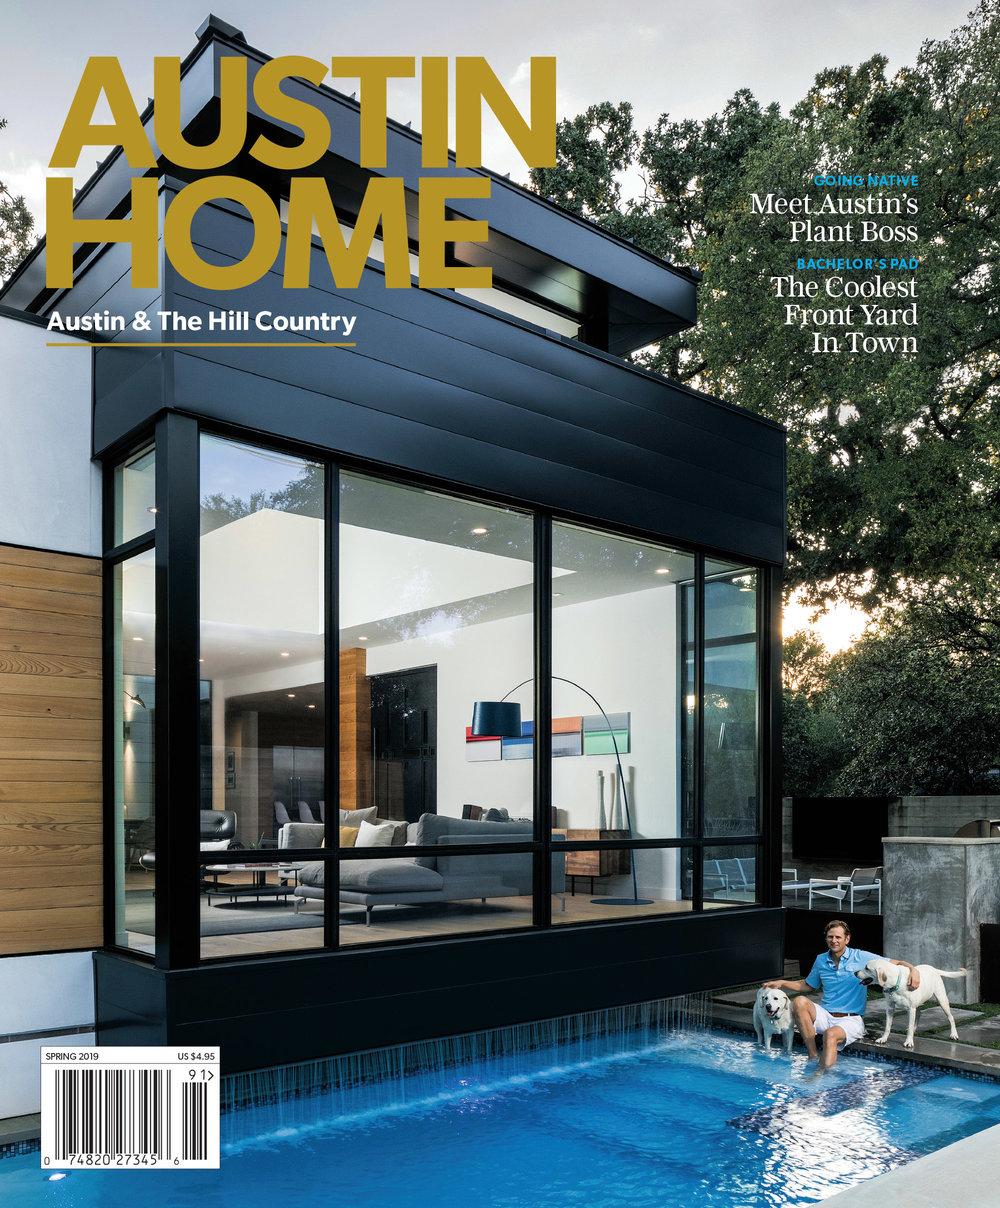 austin-home-cover-photo-jake-holt.jpg